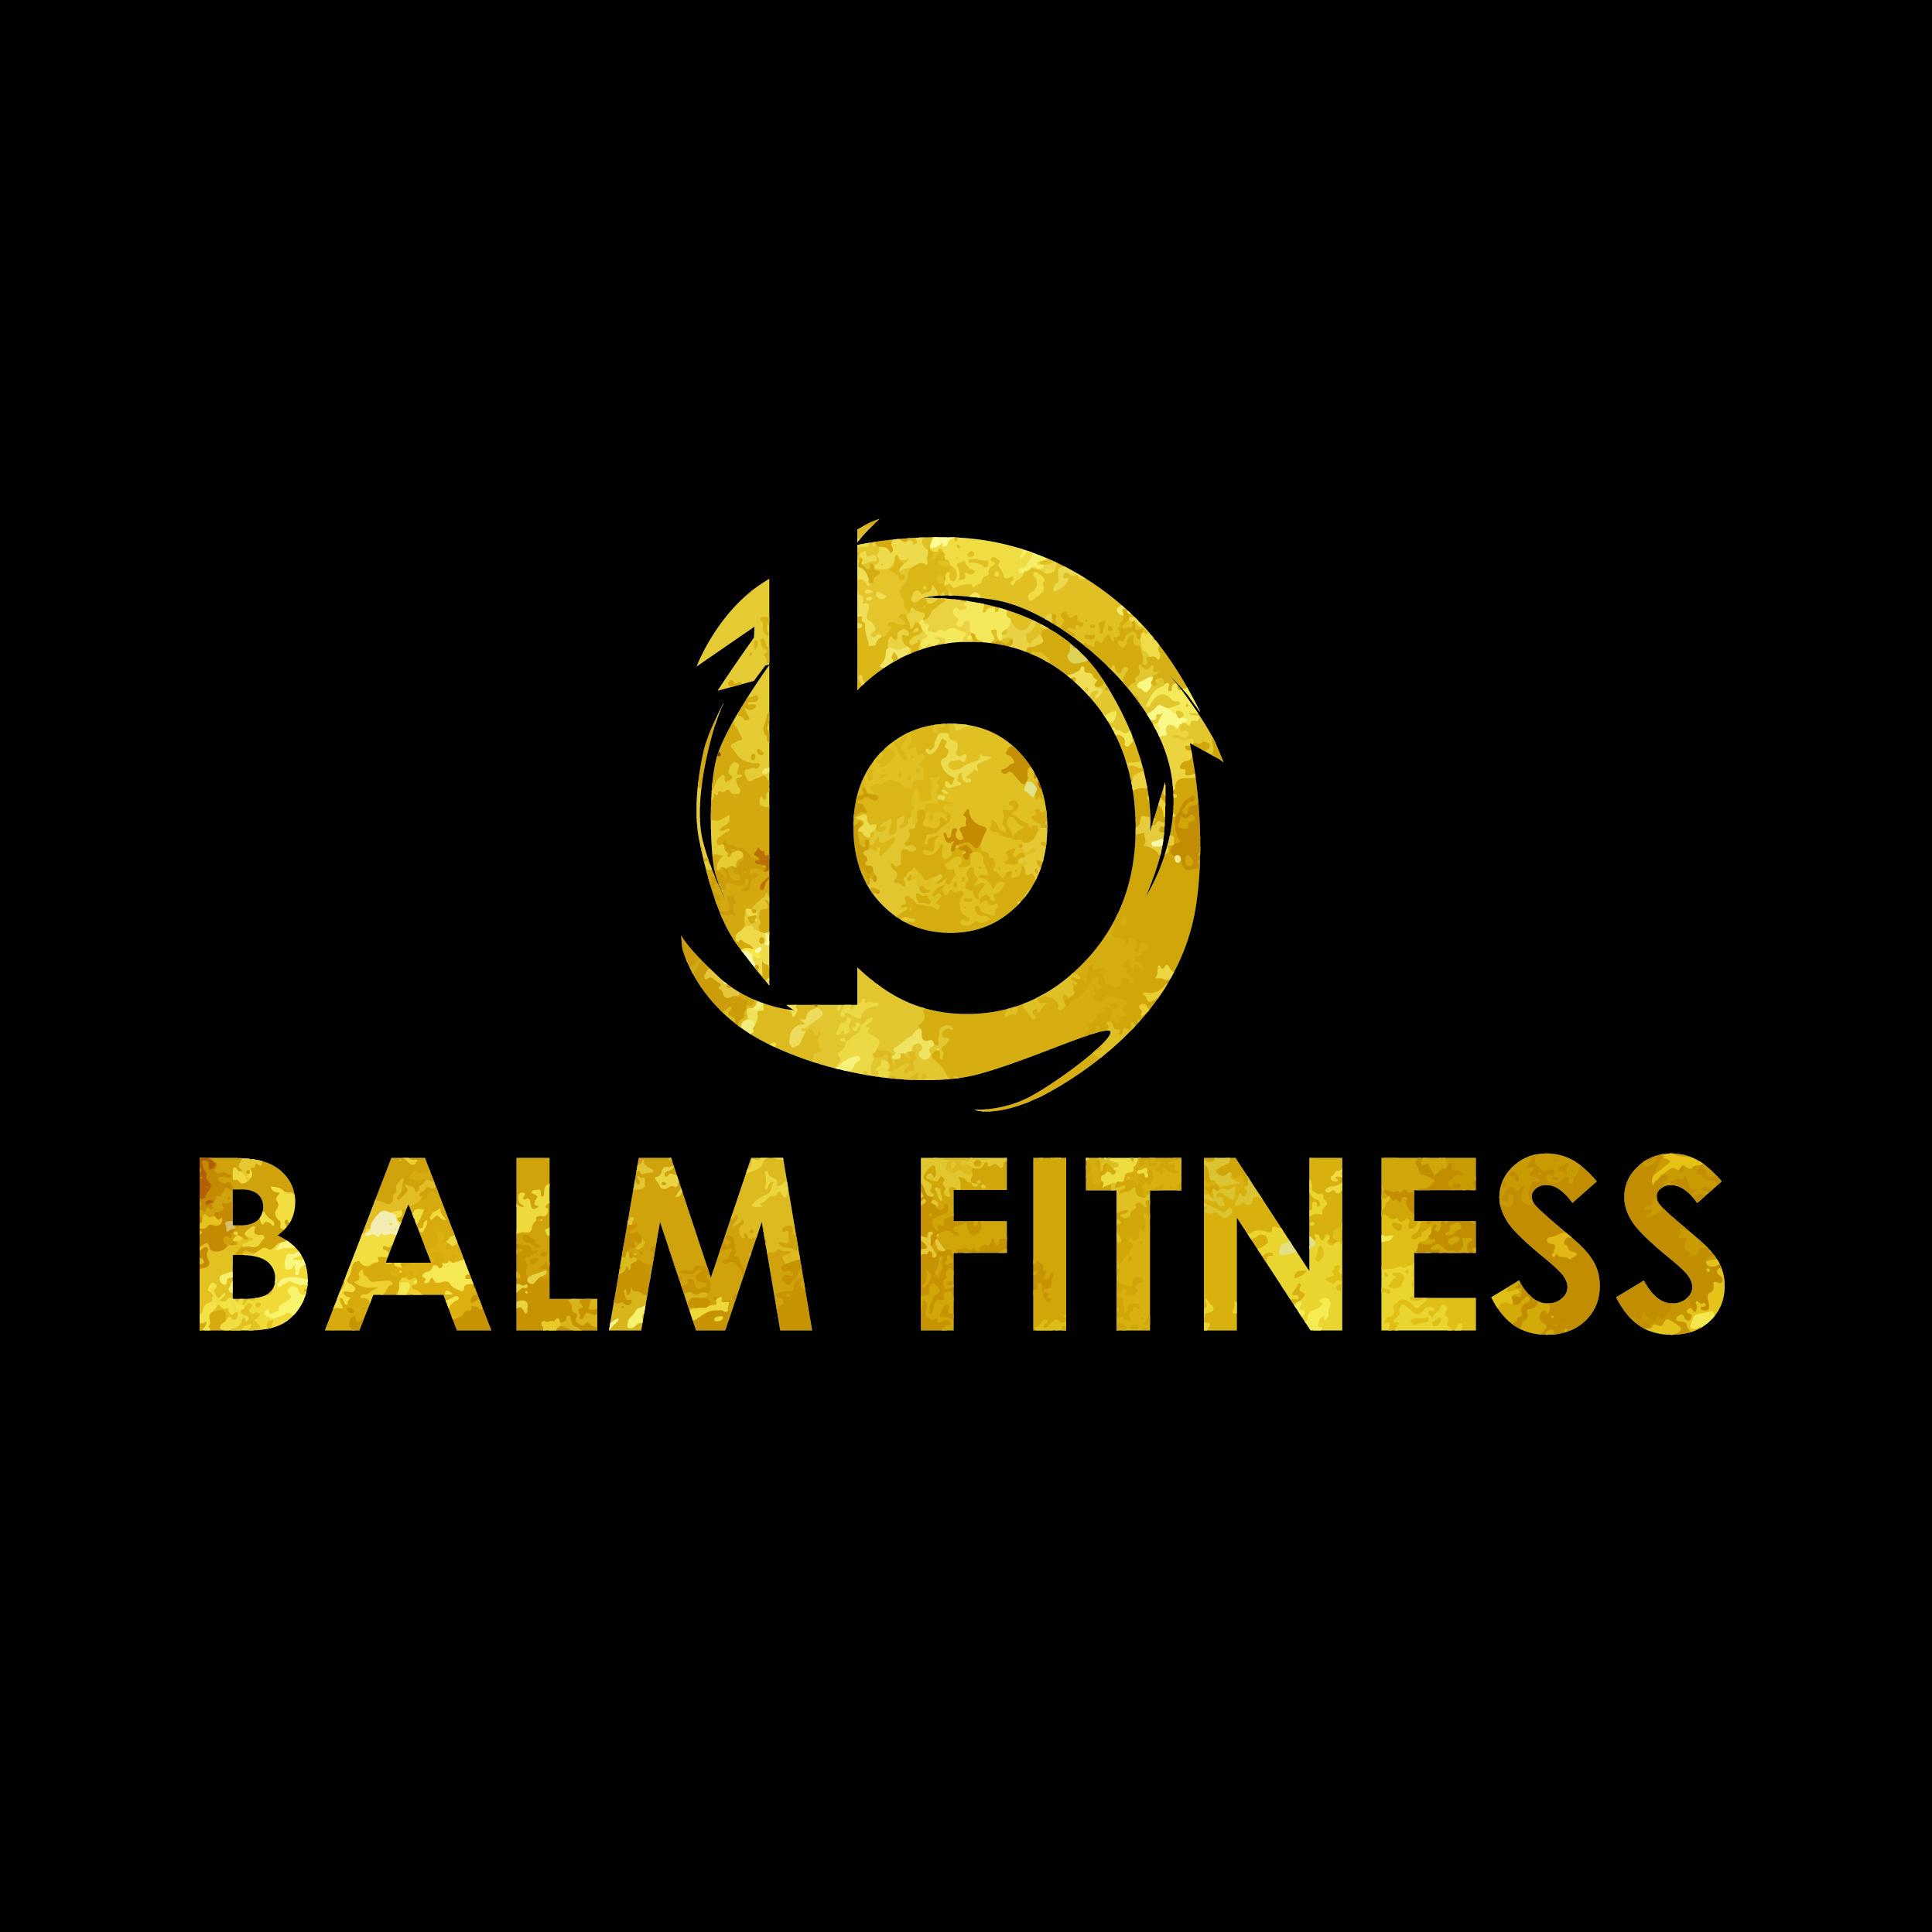 Balm Fitness